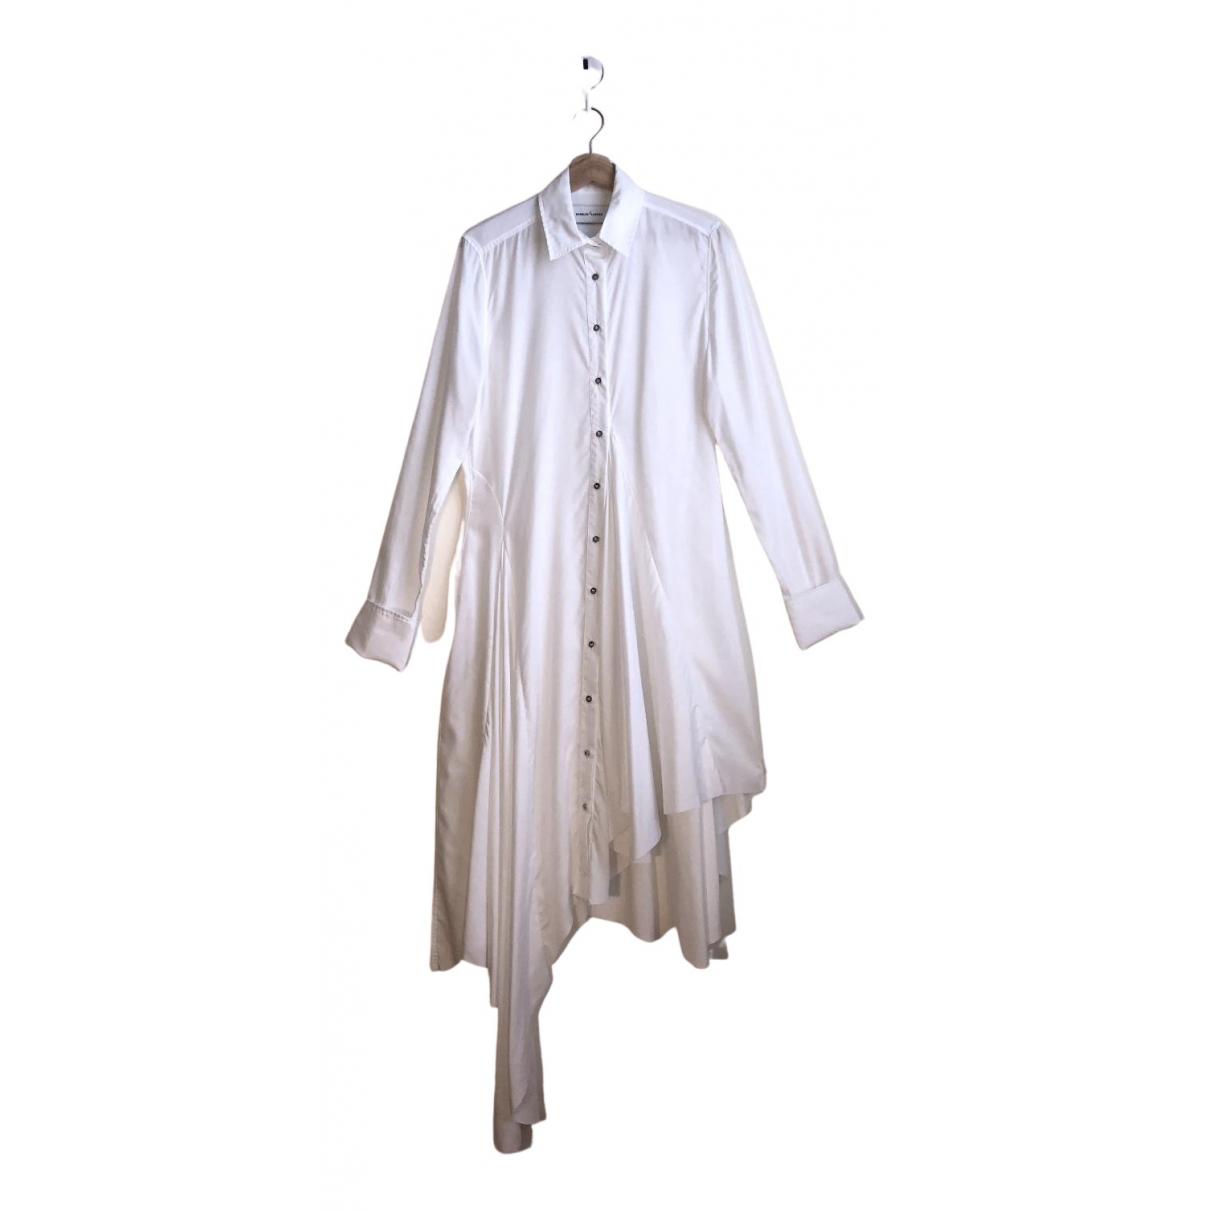 Marques Almeida N White Cotton dress for Women S International